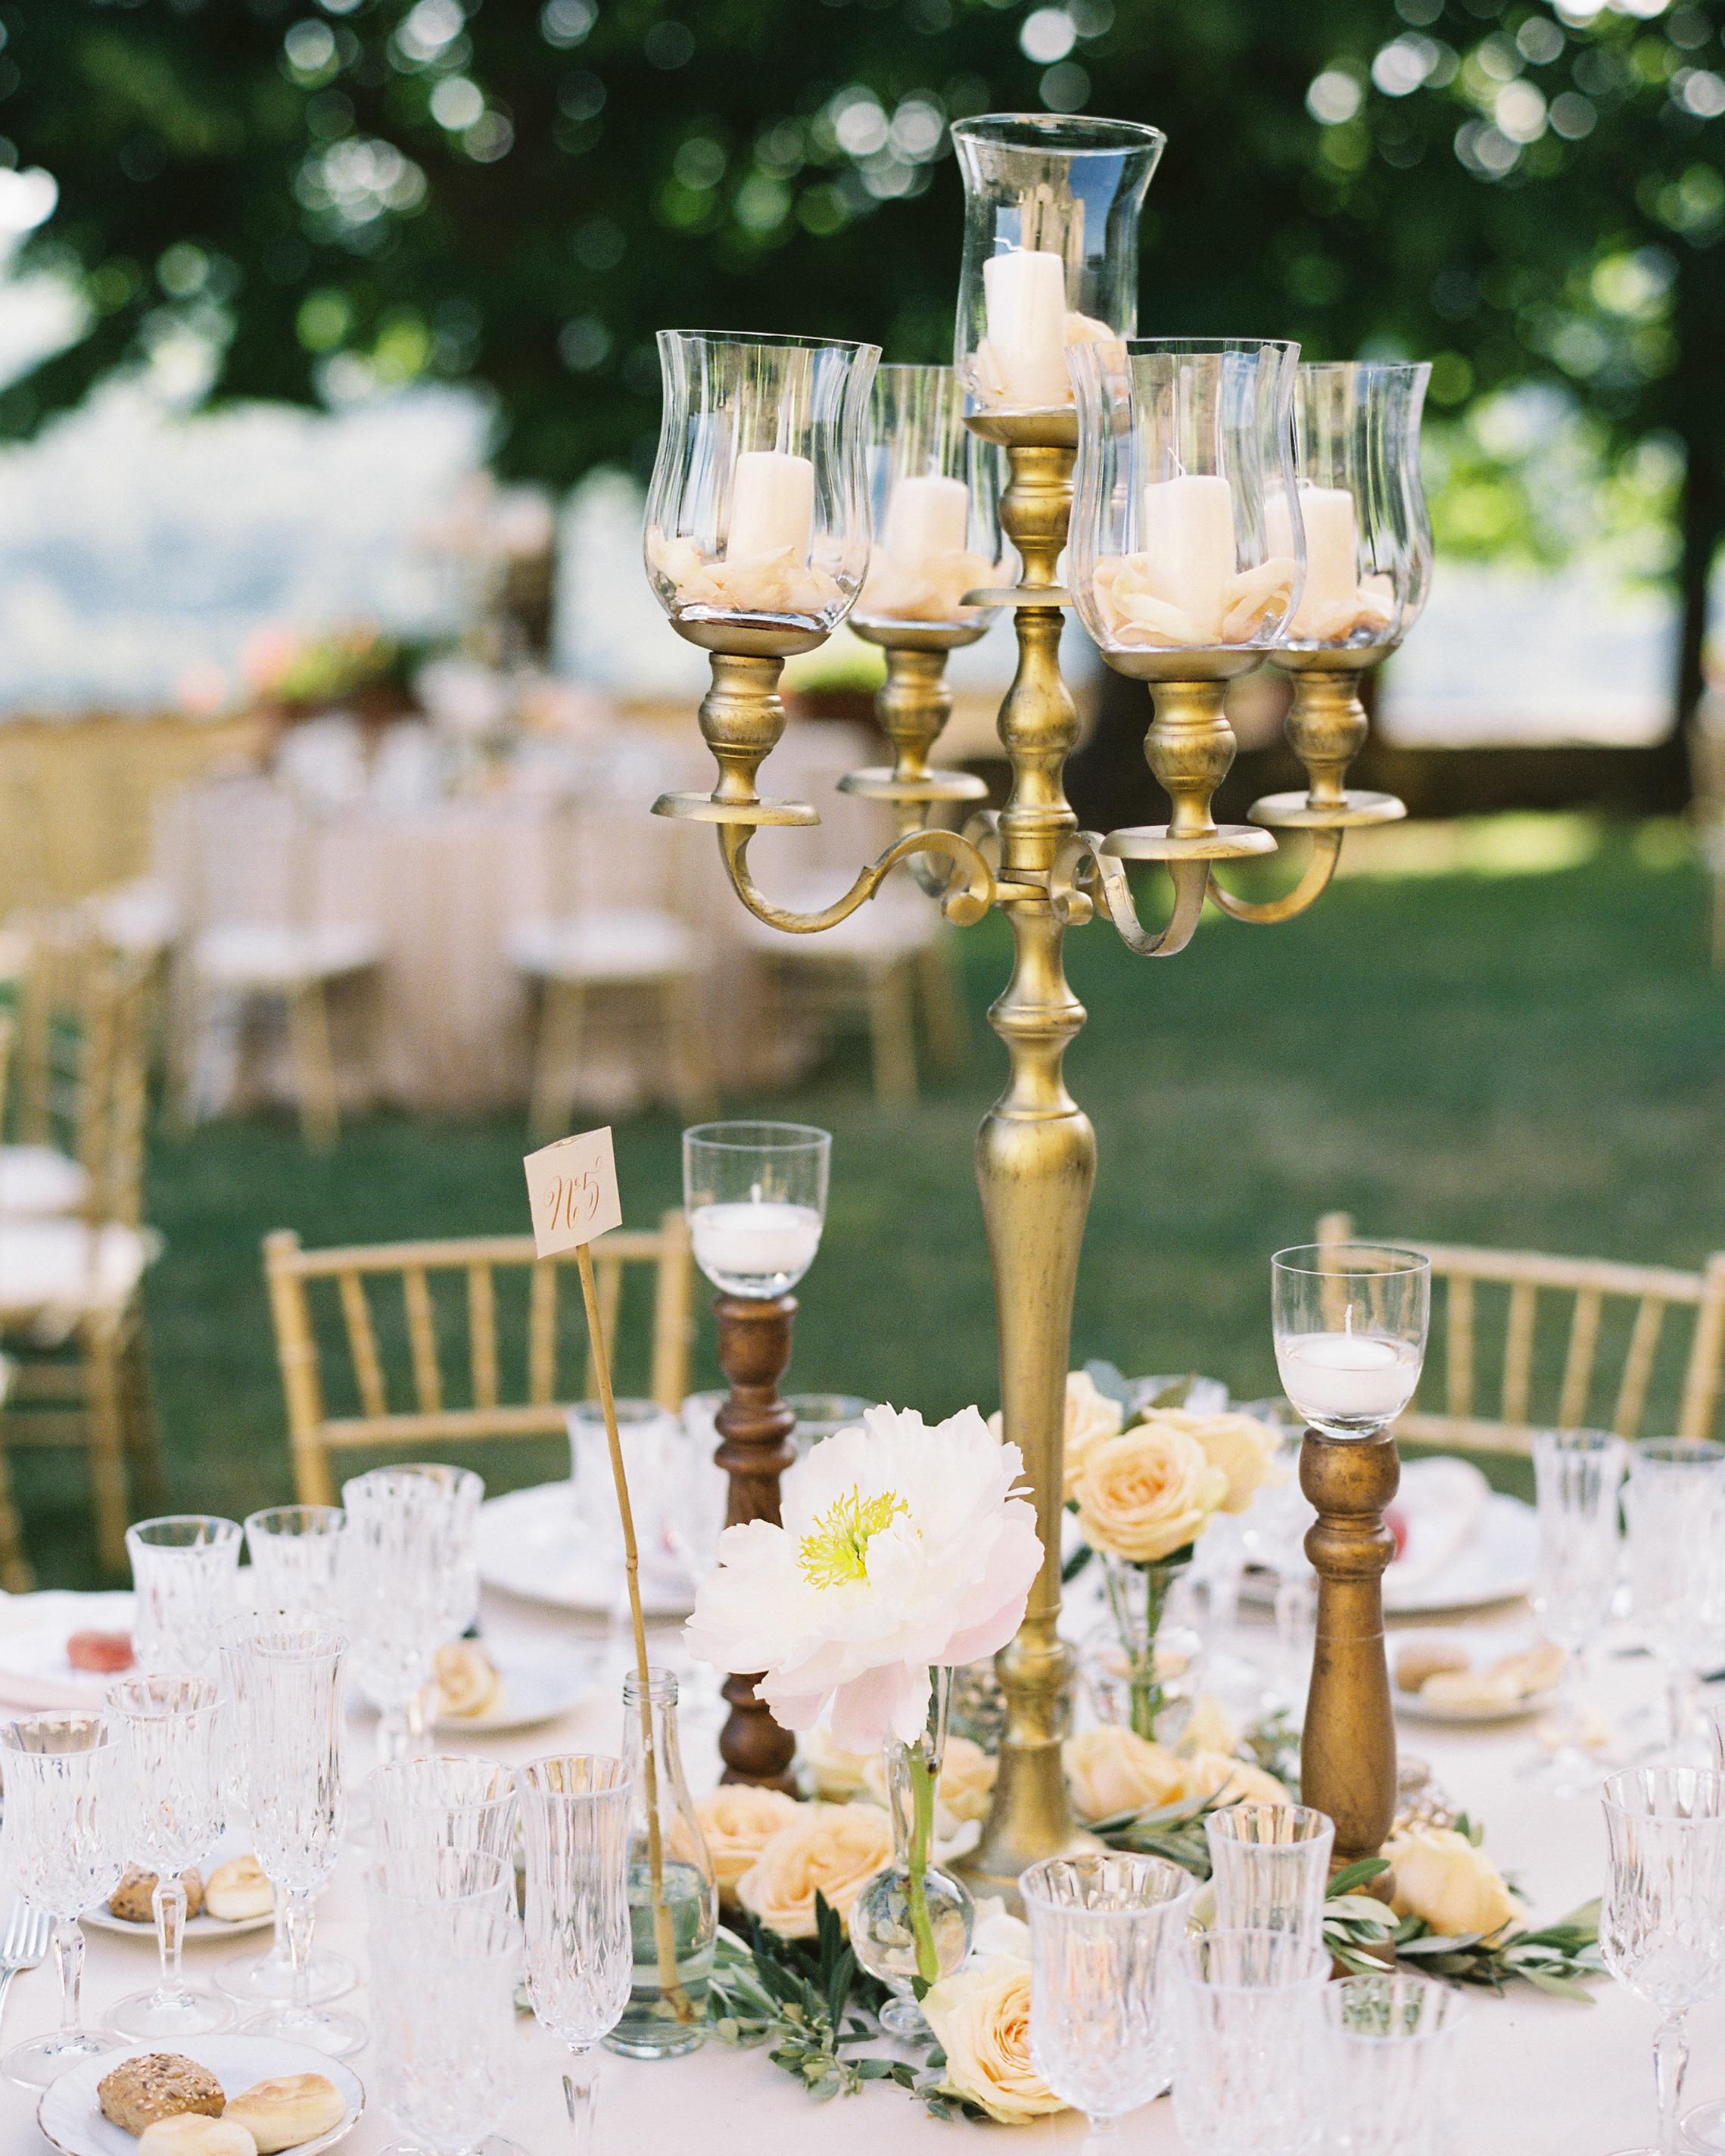 lauren-ollie-wedding-centerpiece-145-s111895-0515.jpg